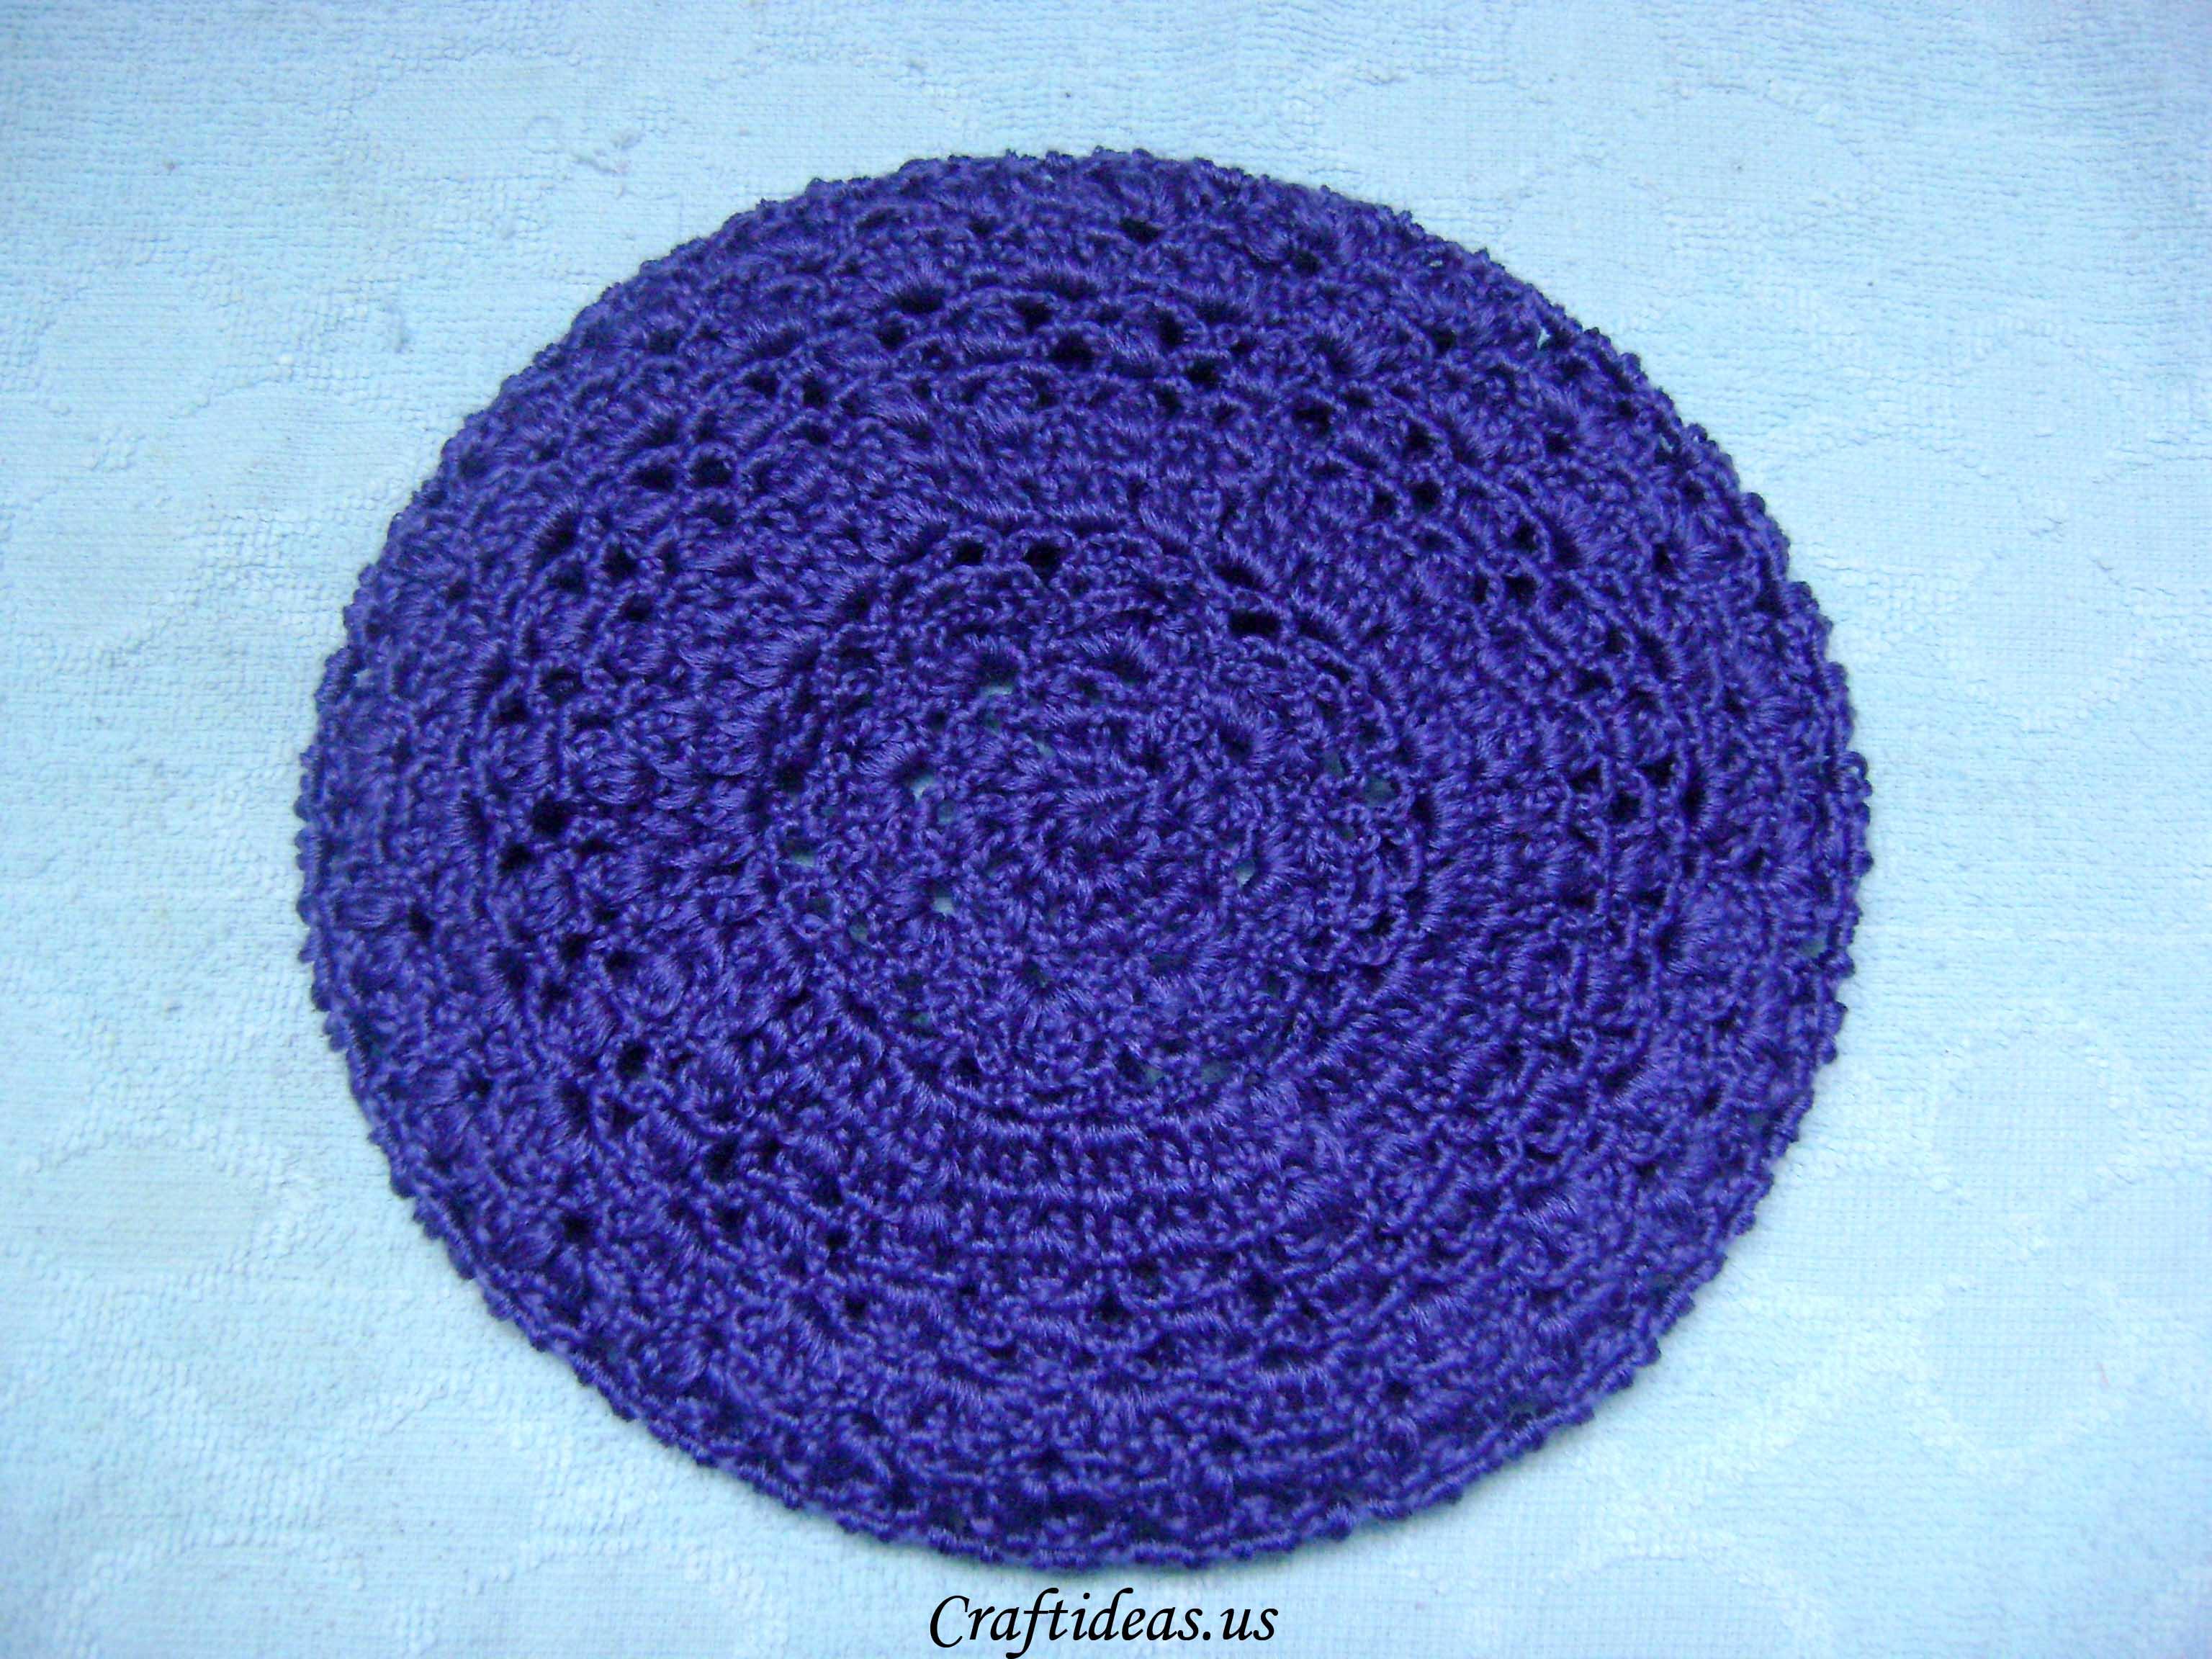 Crochet beret for girls craft ideas for Crochet crafts for kids